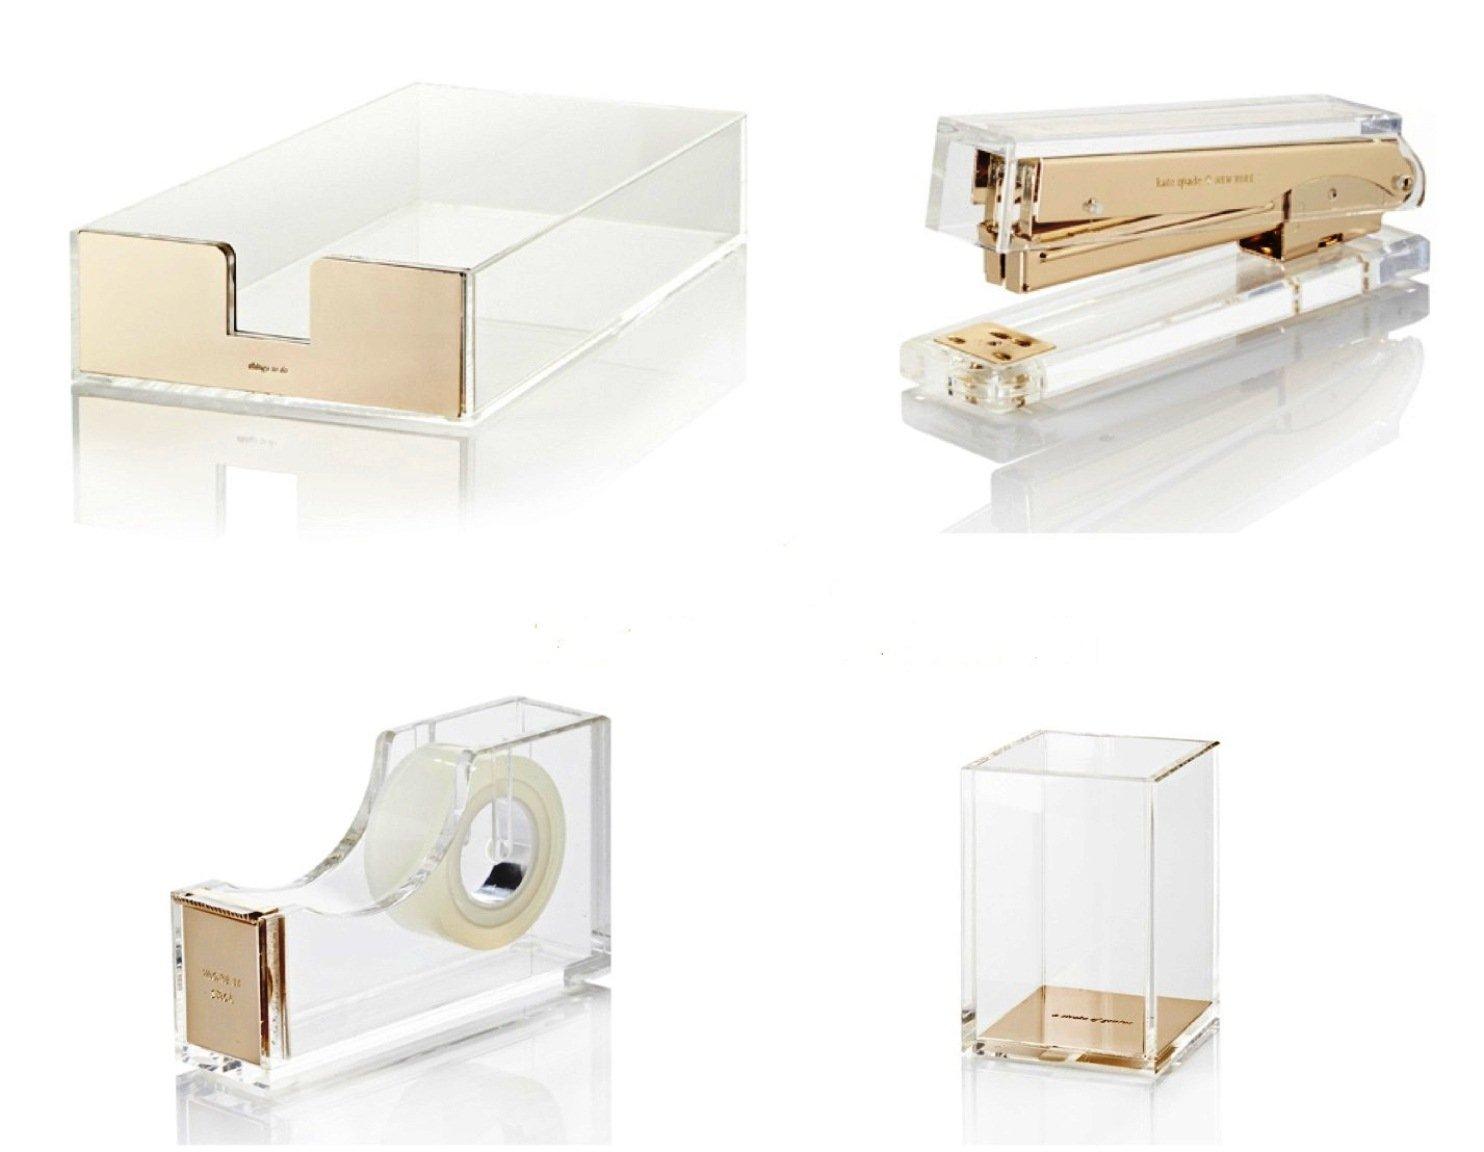 amazoncom bundle 4 items kate spade new york acrylic desk set office products acrylic office desk